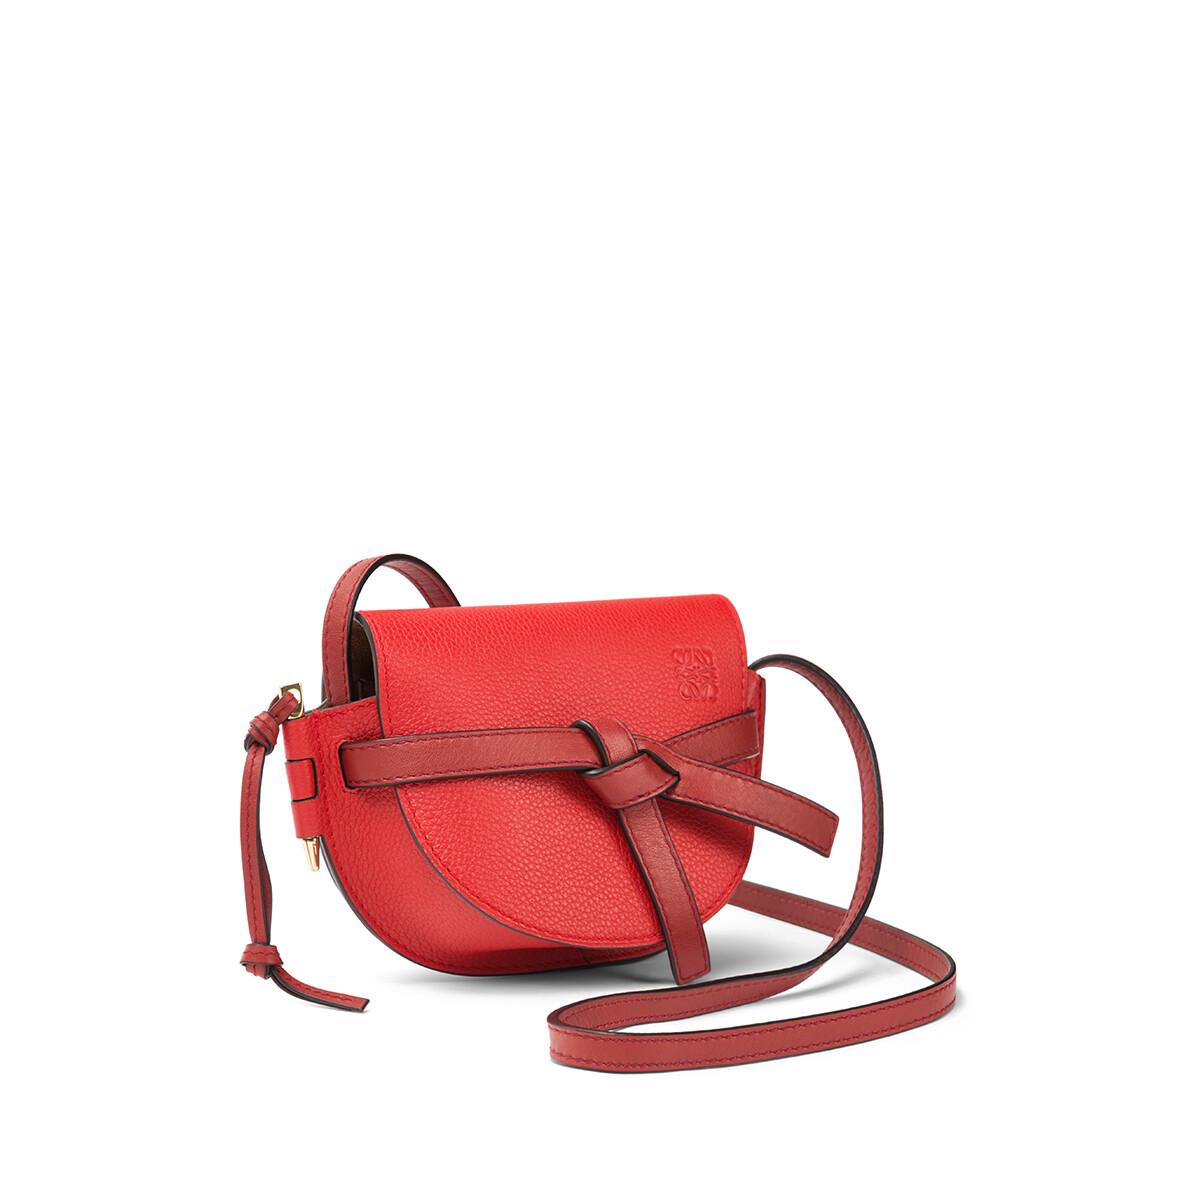 LOEWE Gate迷你手袋 Scarlet Red/Burnt Red front